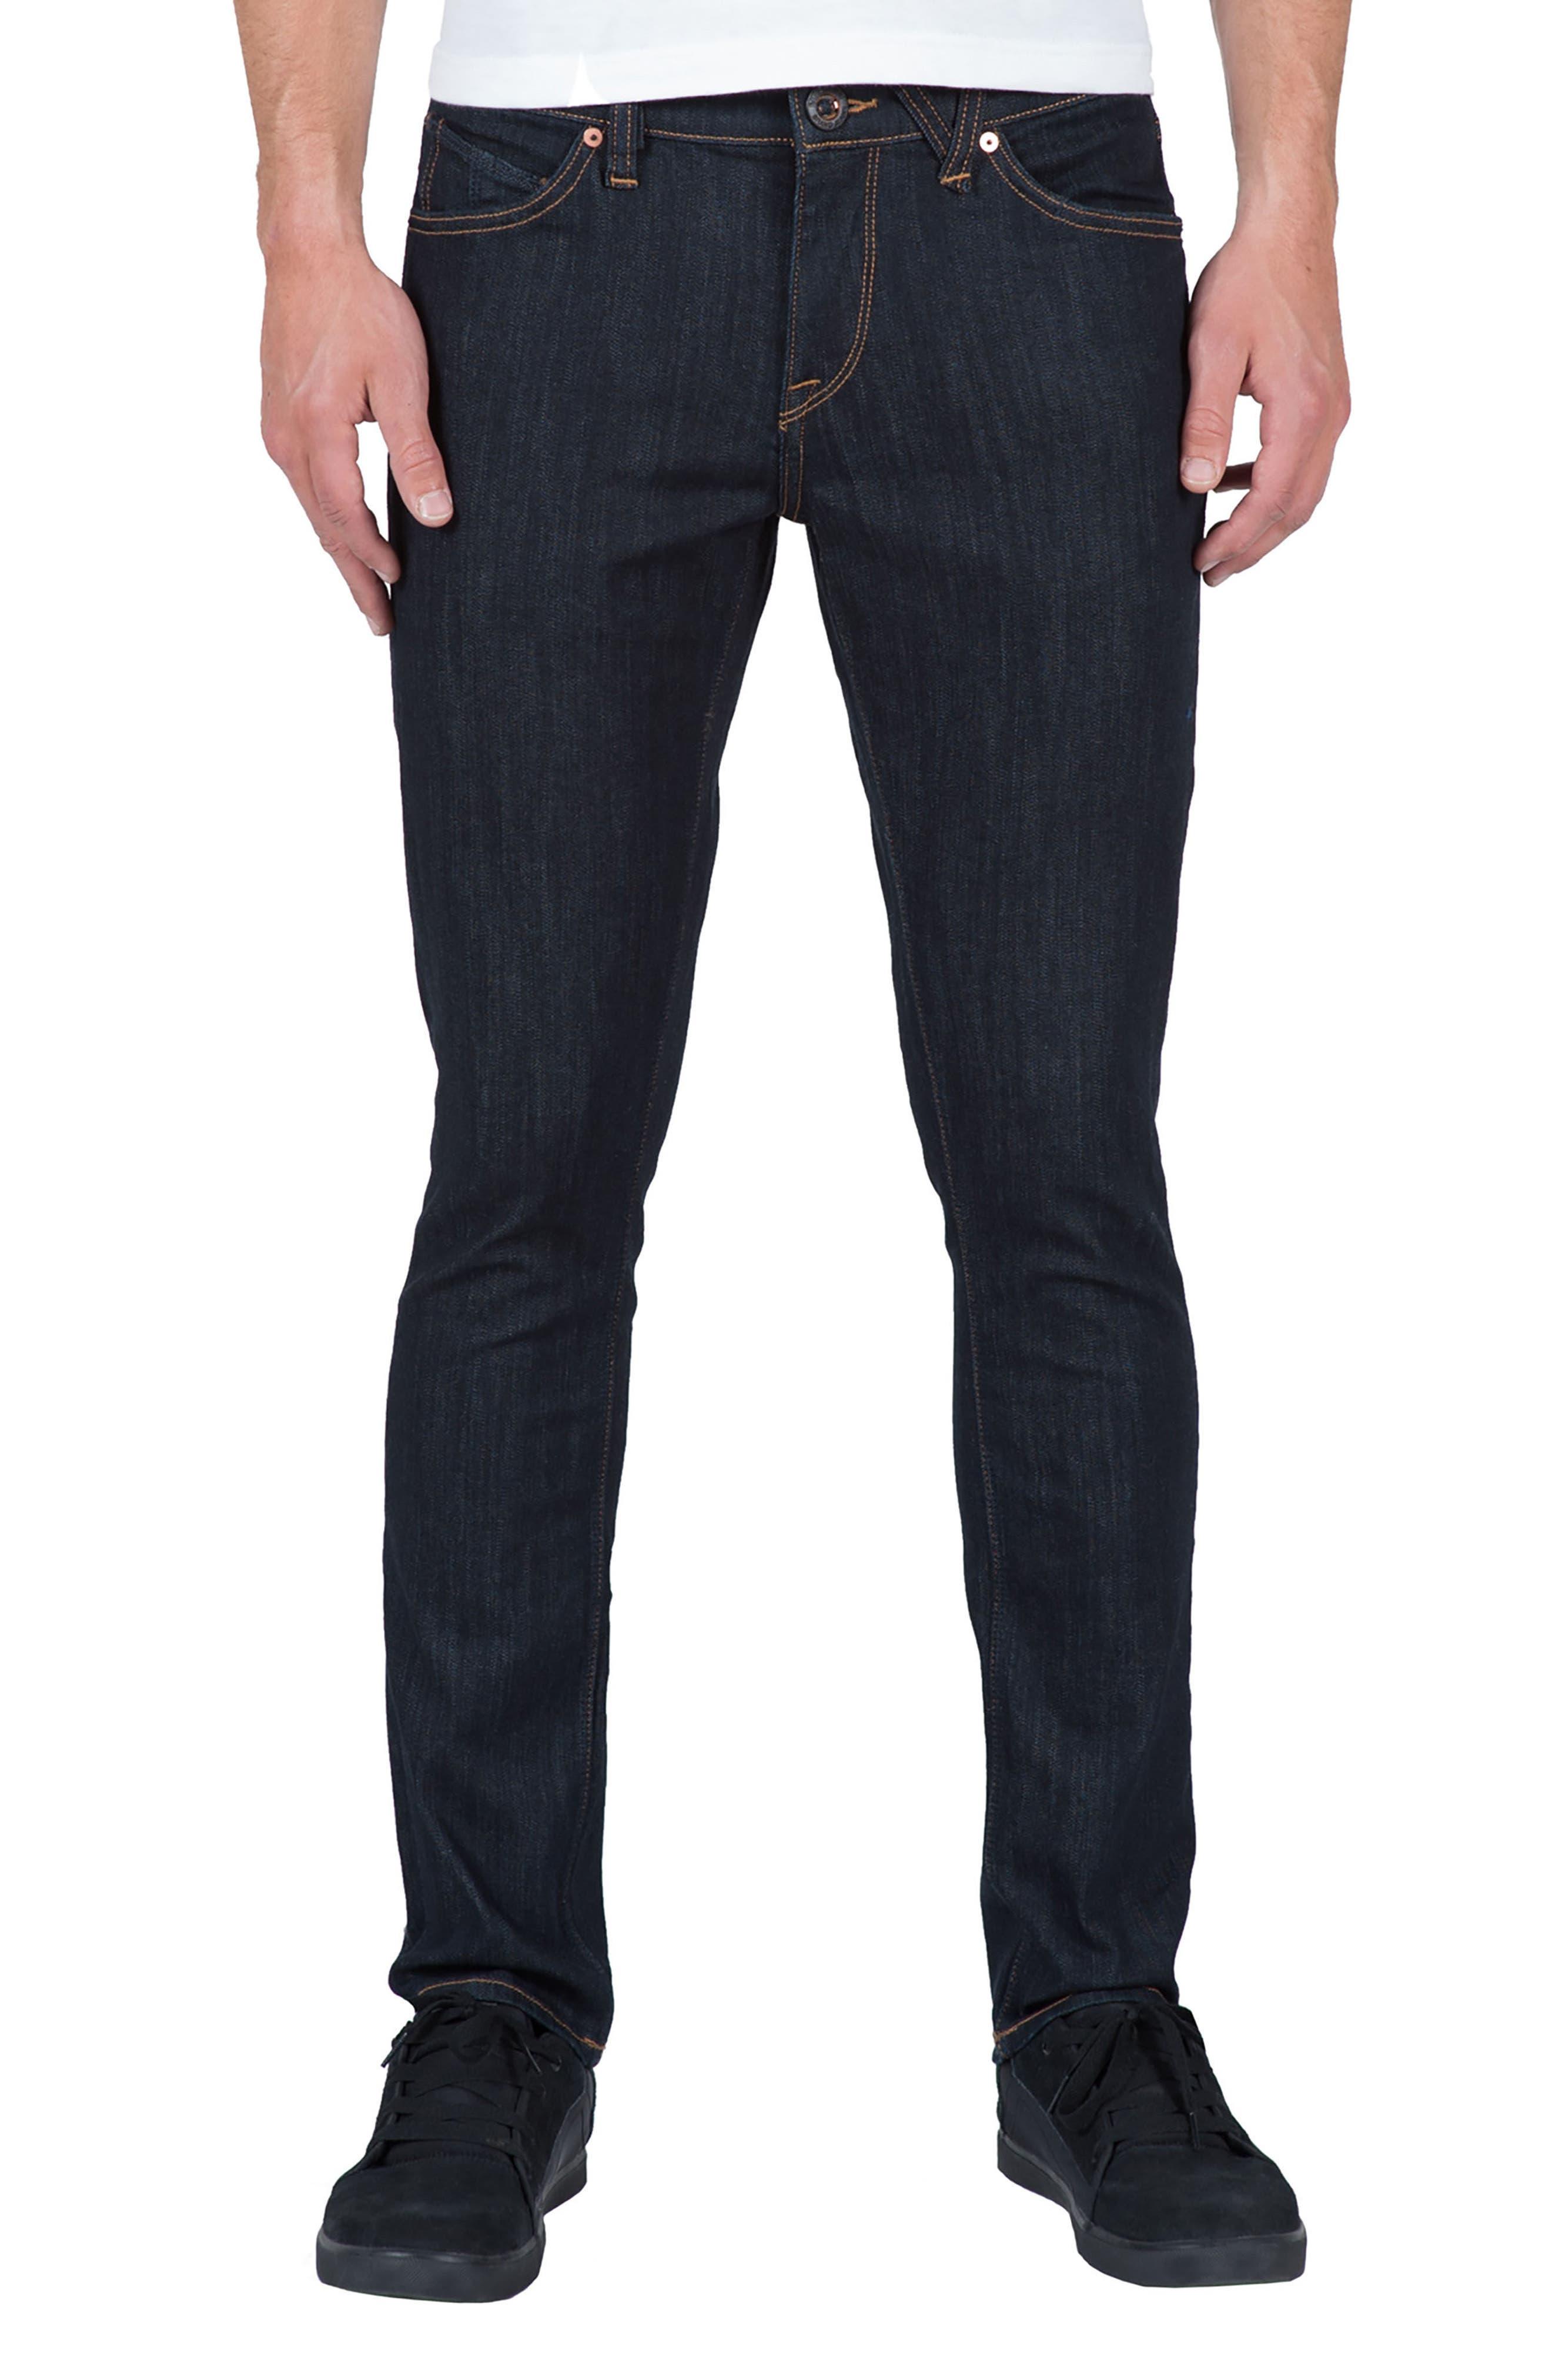 2x4 Slim Straight Leg Jeans,                             Main thumbnail 1, color,                             Blue Rinse